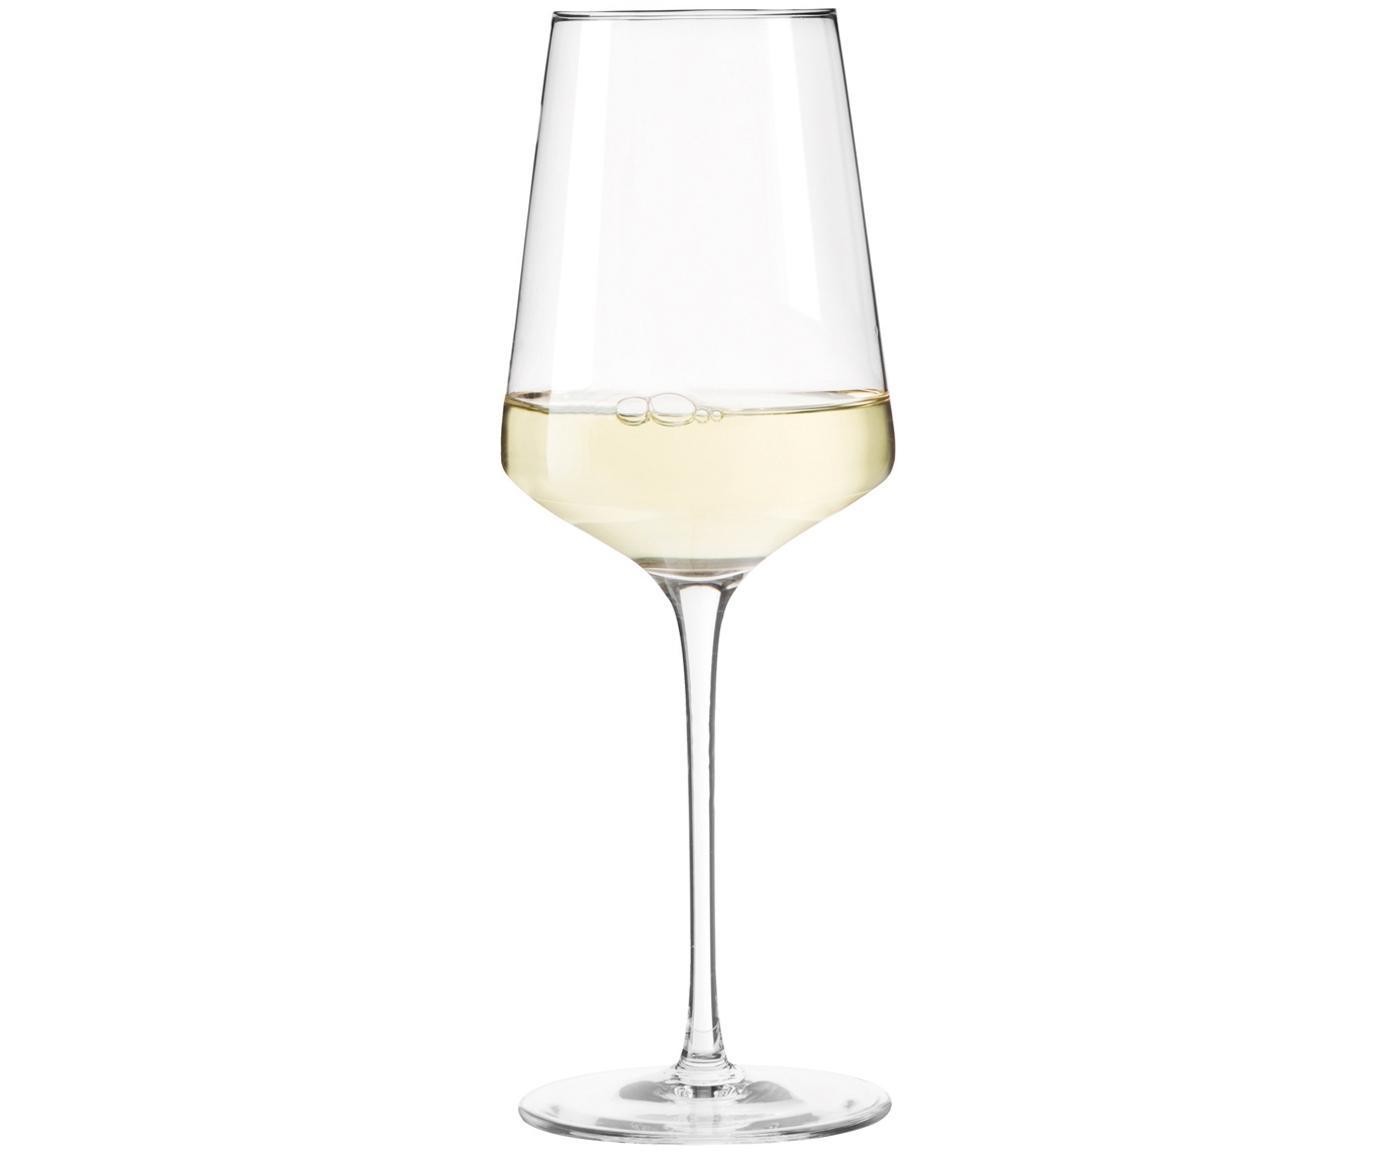 Weißweingläser Puccini, 6er-Set, Teqton®-Glas, Transparent, Ø 8 x H 23 cm